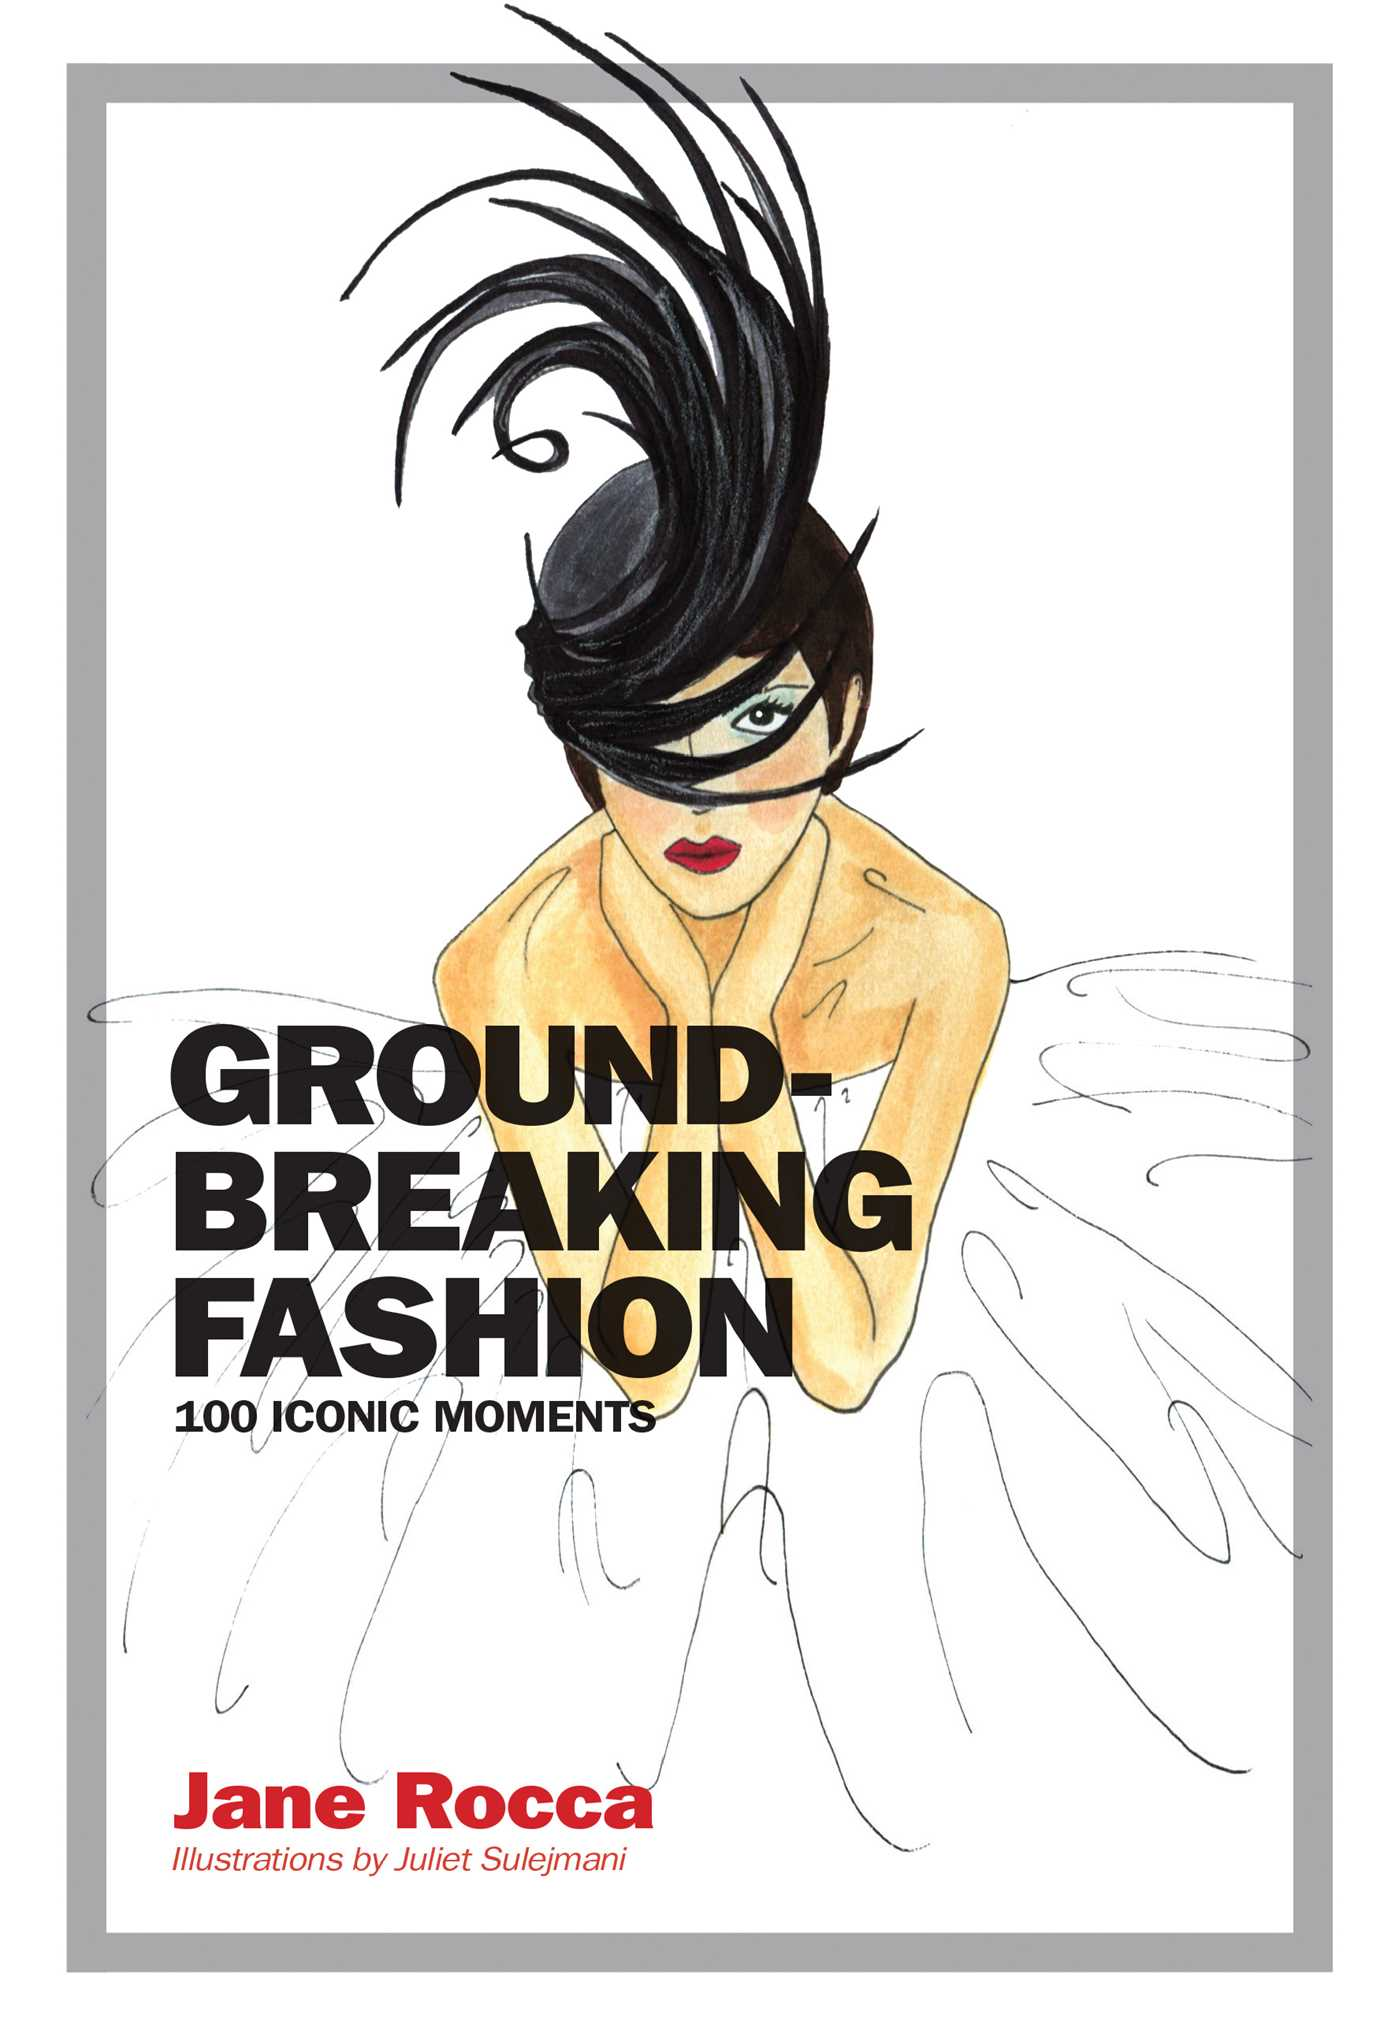 groundbreaking-fashion-100-iconic-fashion-moments-9781925418323_hr.jpg